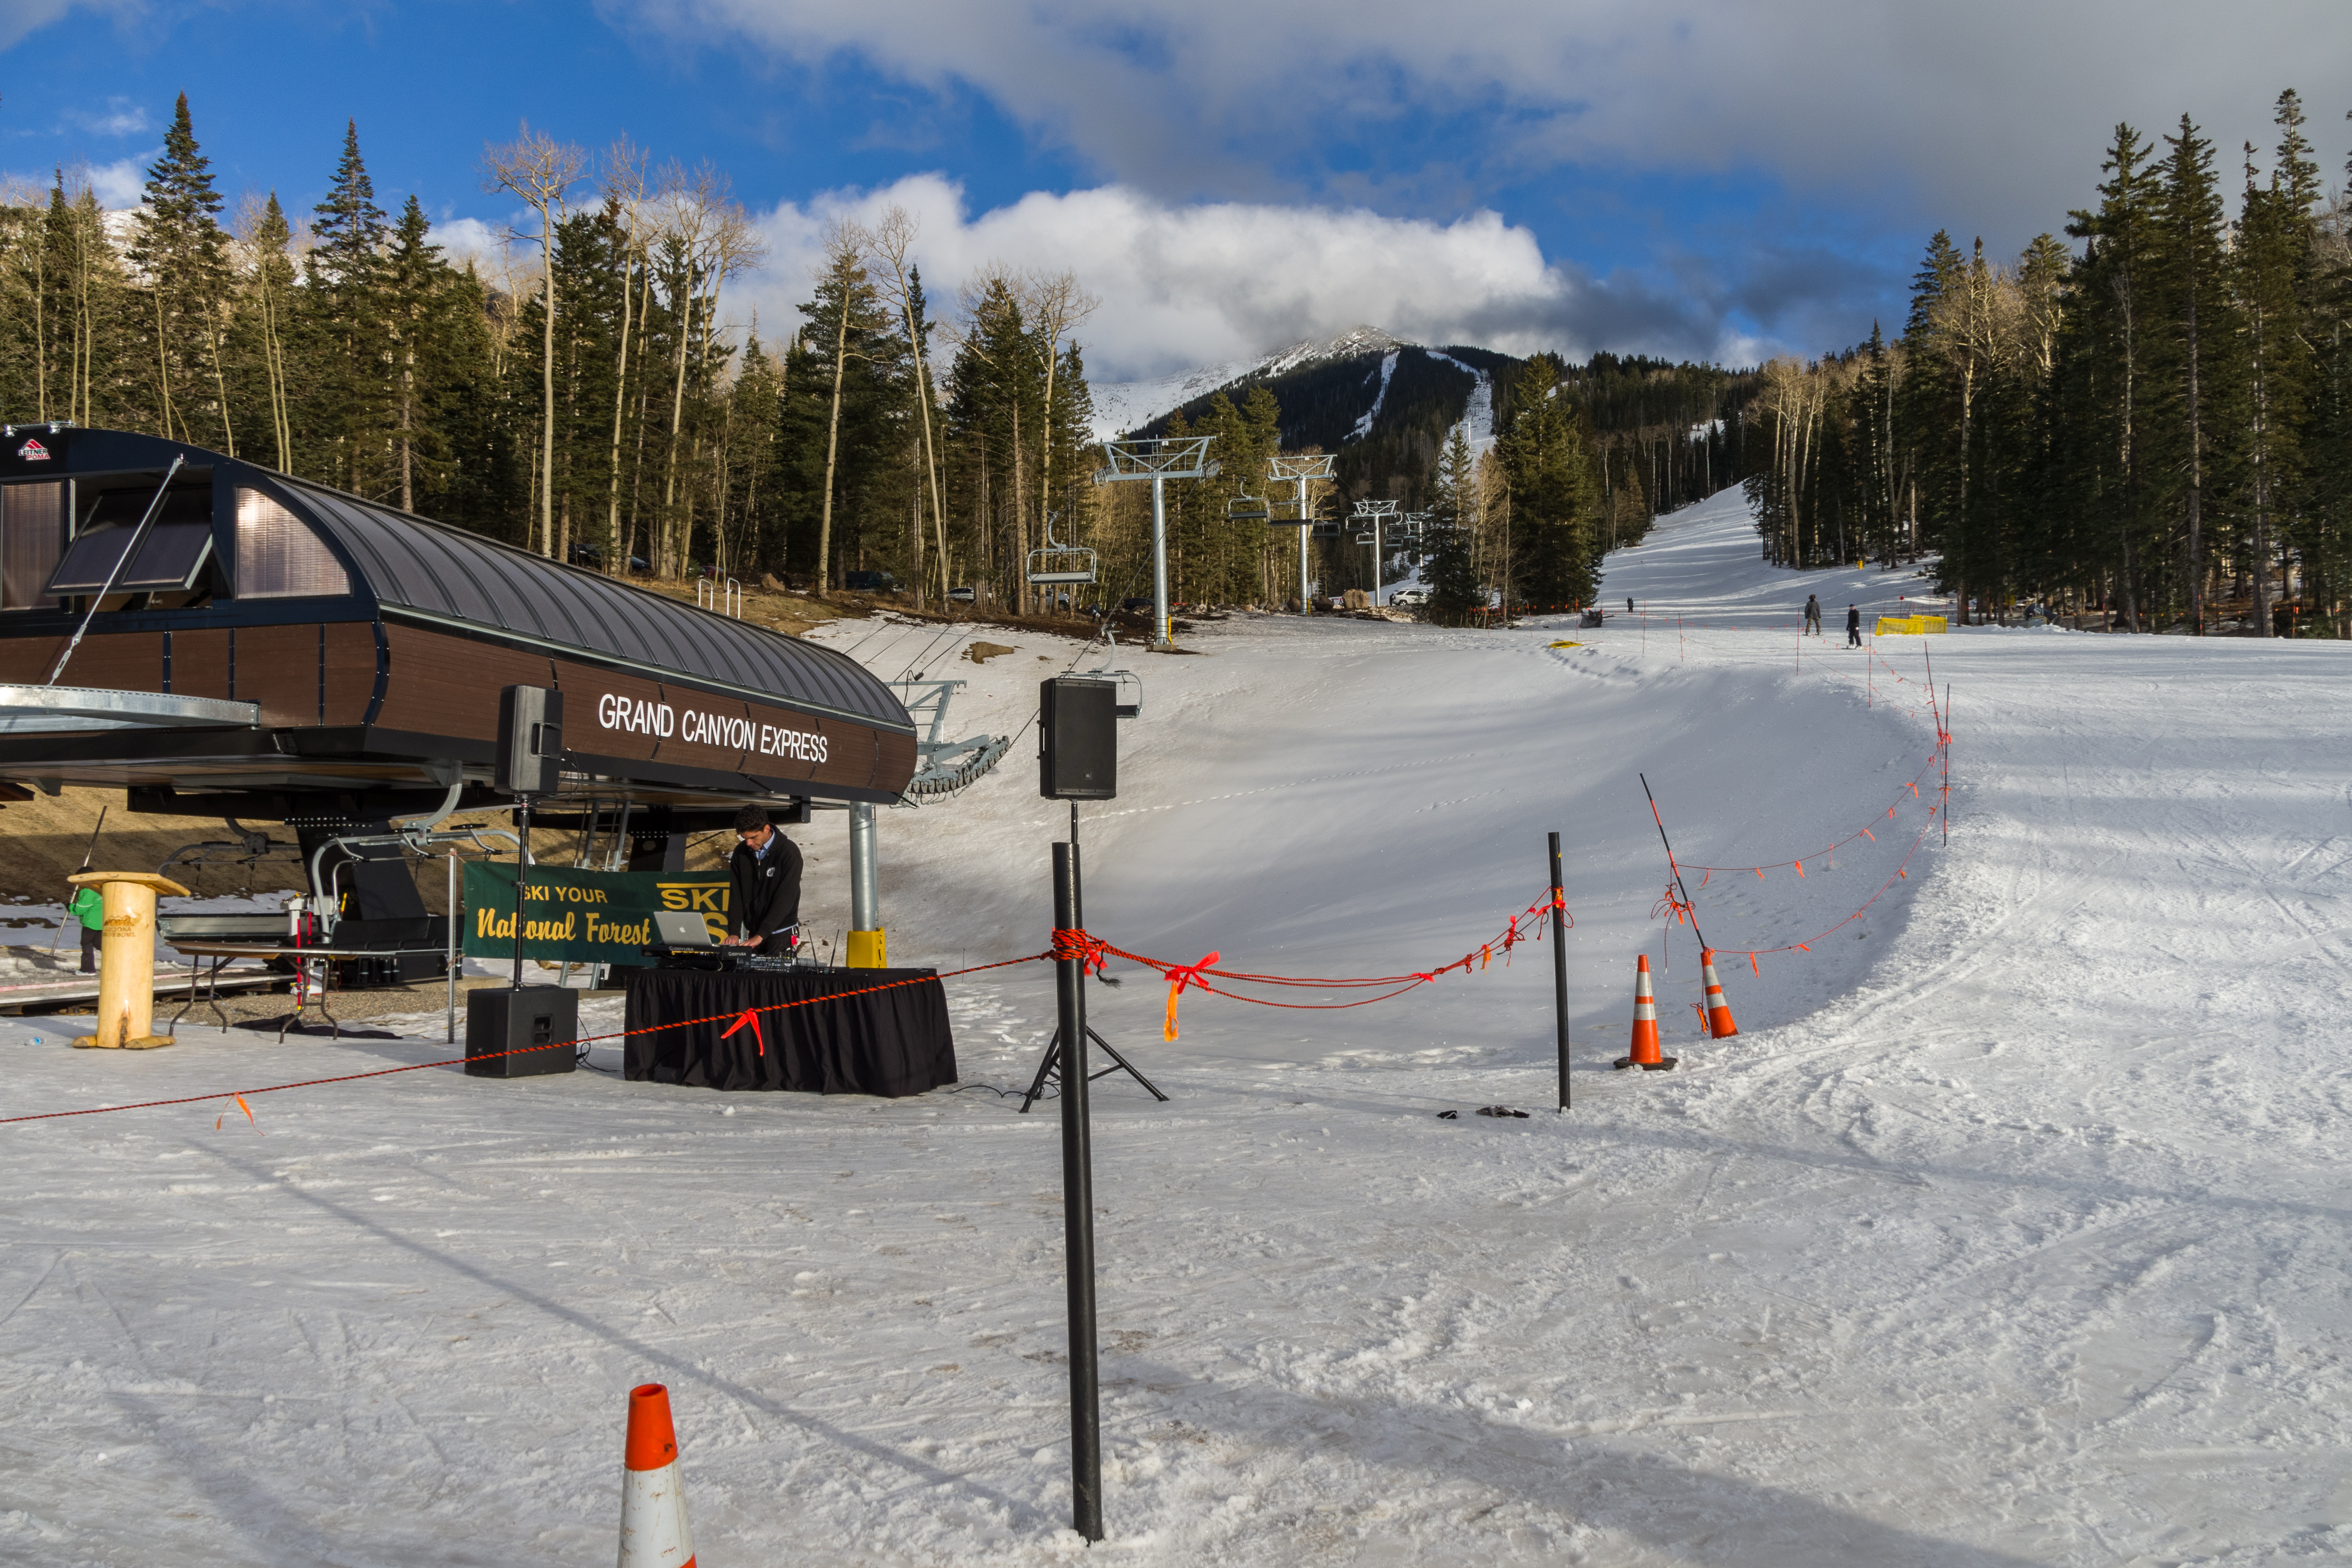 Arizona Snowbowl Grand Canyon Express Ski Lift Opening Celebration (30763786764).jpg